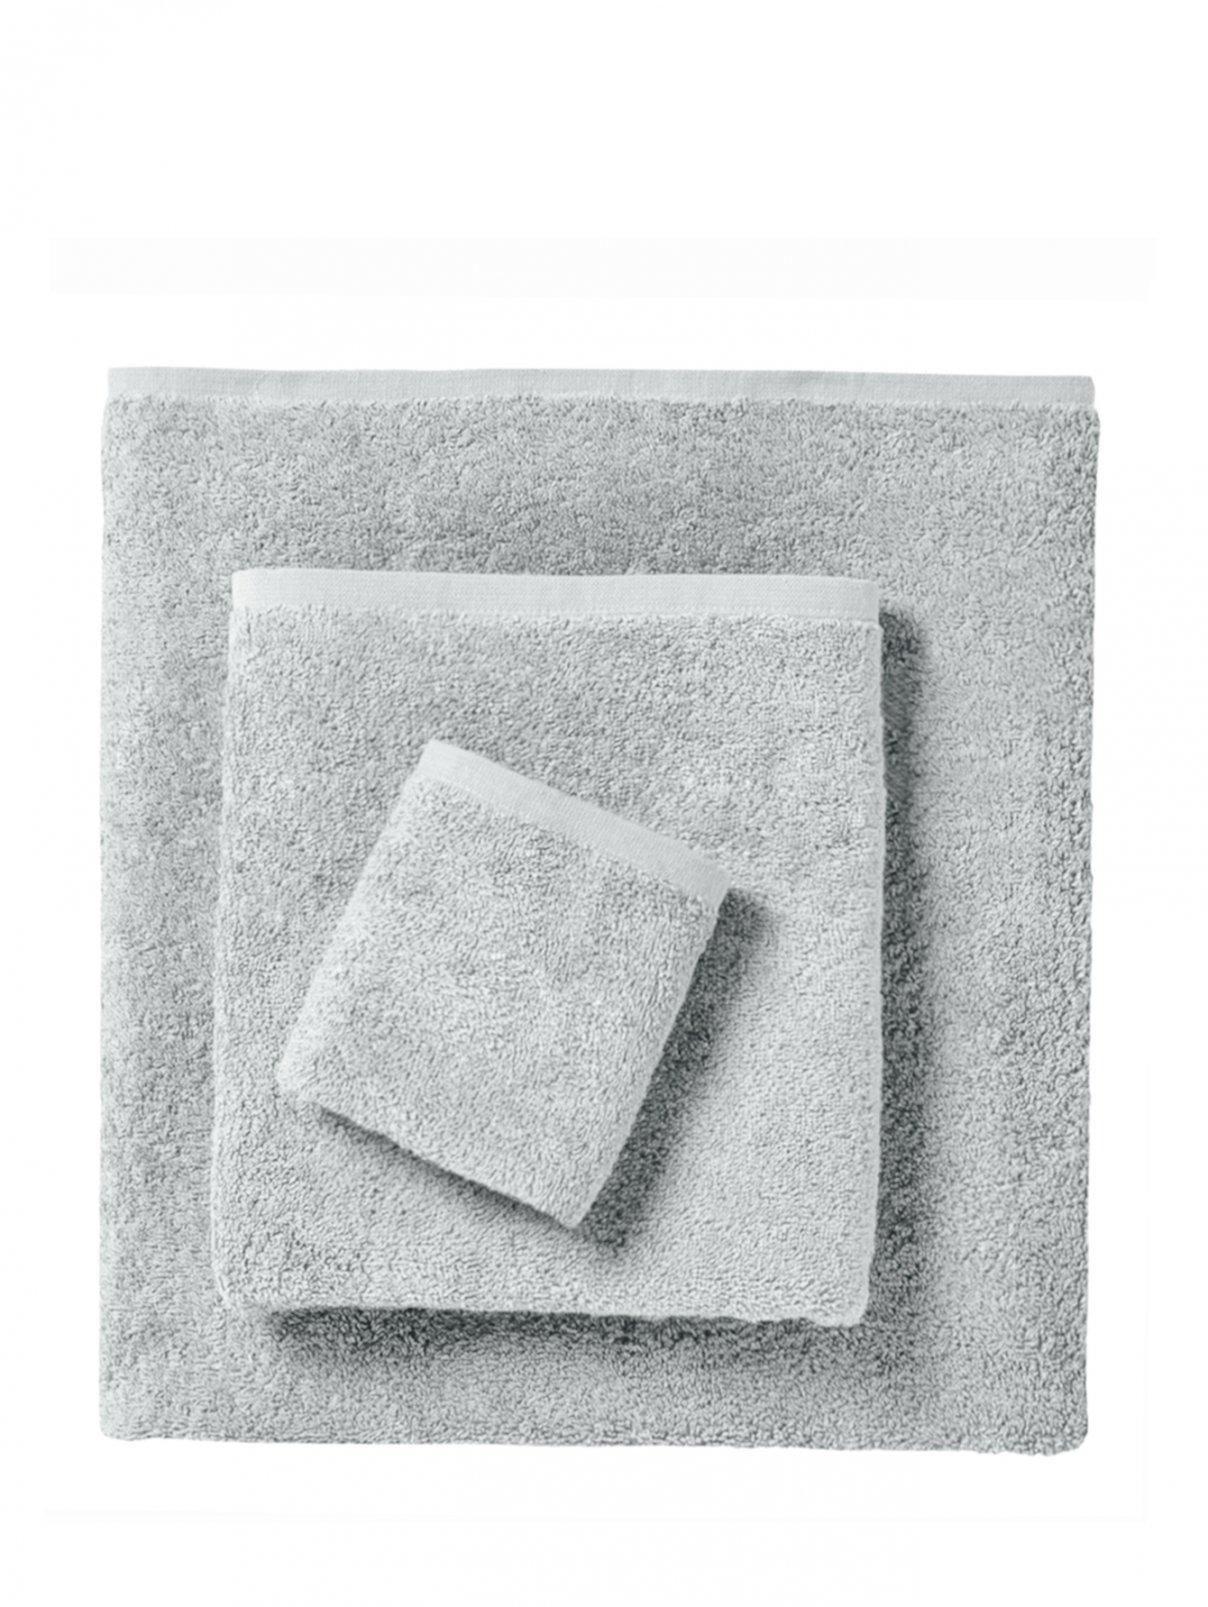 Полотенце  40х70 см Amalia home collection  –  Общий вид